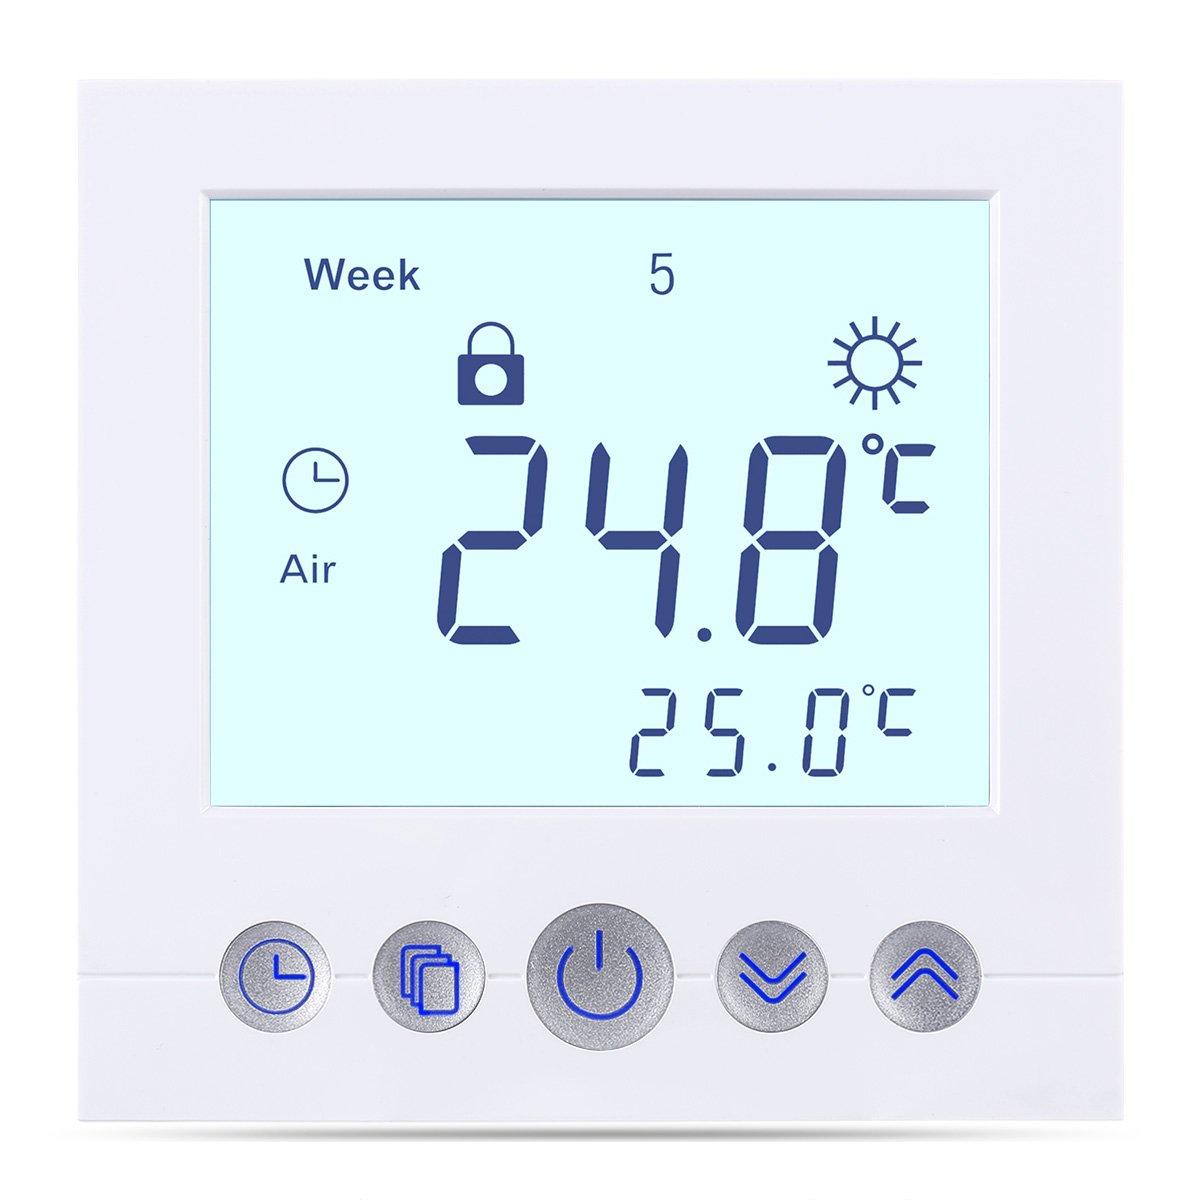 FLOUREON digital Thermostat programmierbar Raumthermostat f/ür Fussbodenheizung Wasser Heizung Wandheizung Wandthermostat mit LED Touchscreen 230V 3A Raumtemperaturregler